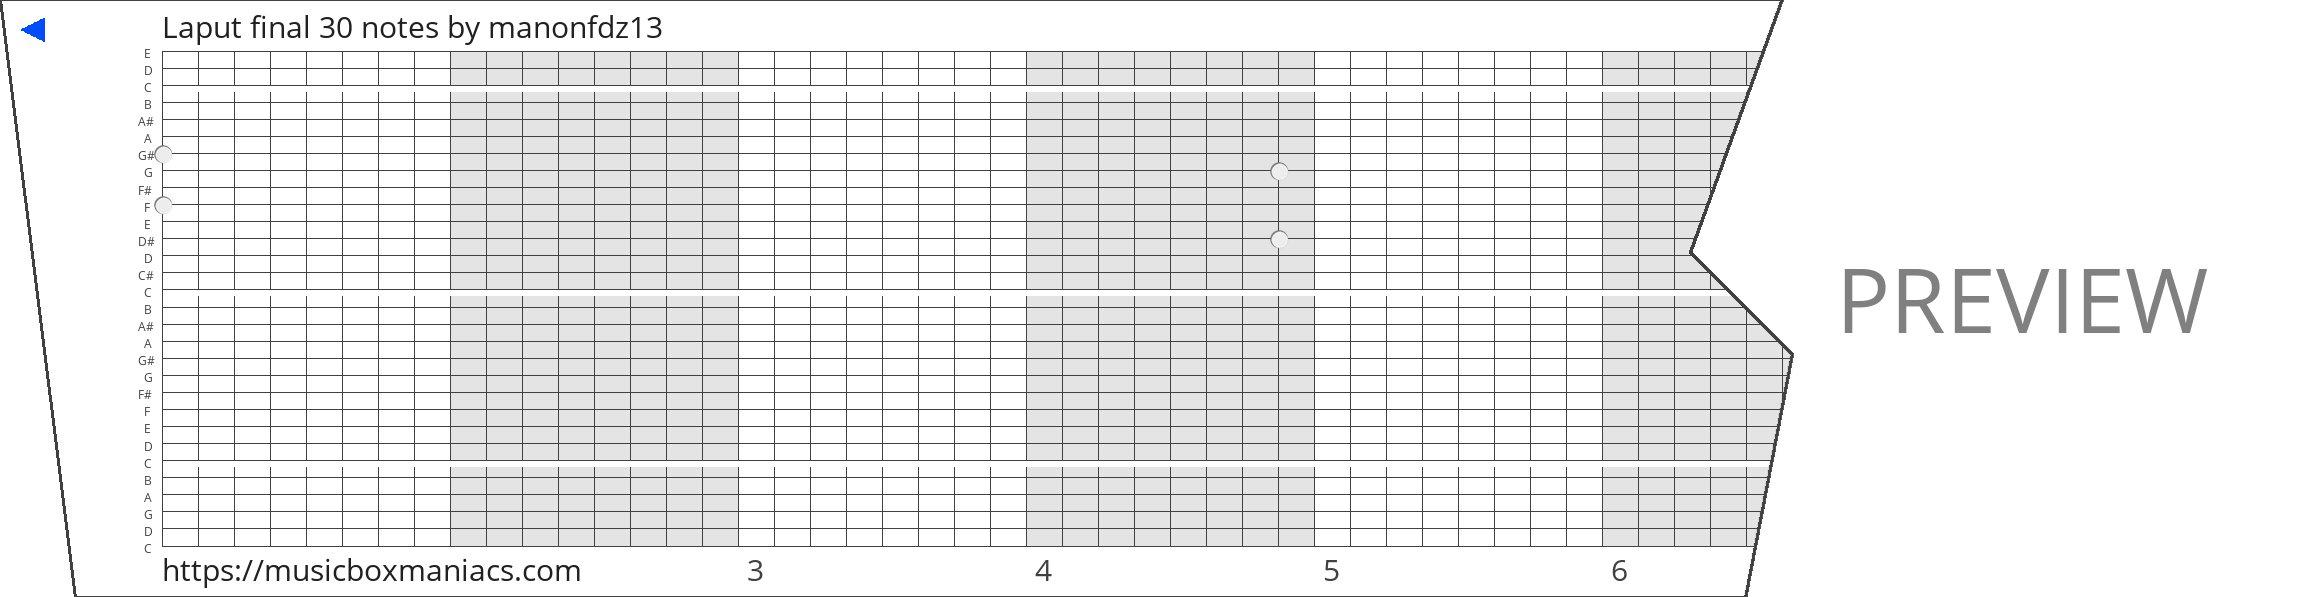 Laput final 30 notes 30 note music box paper strip